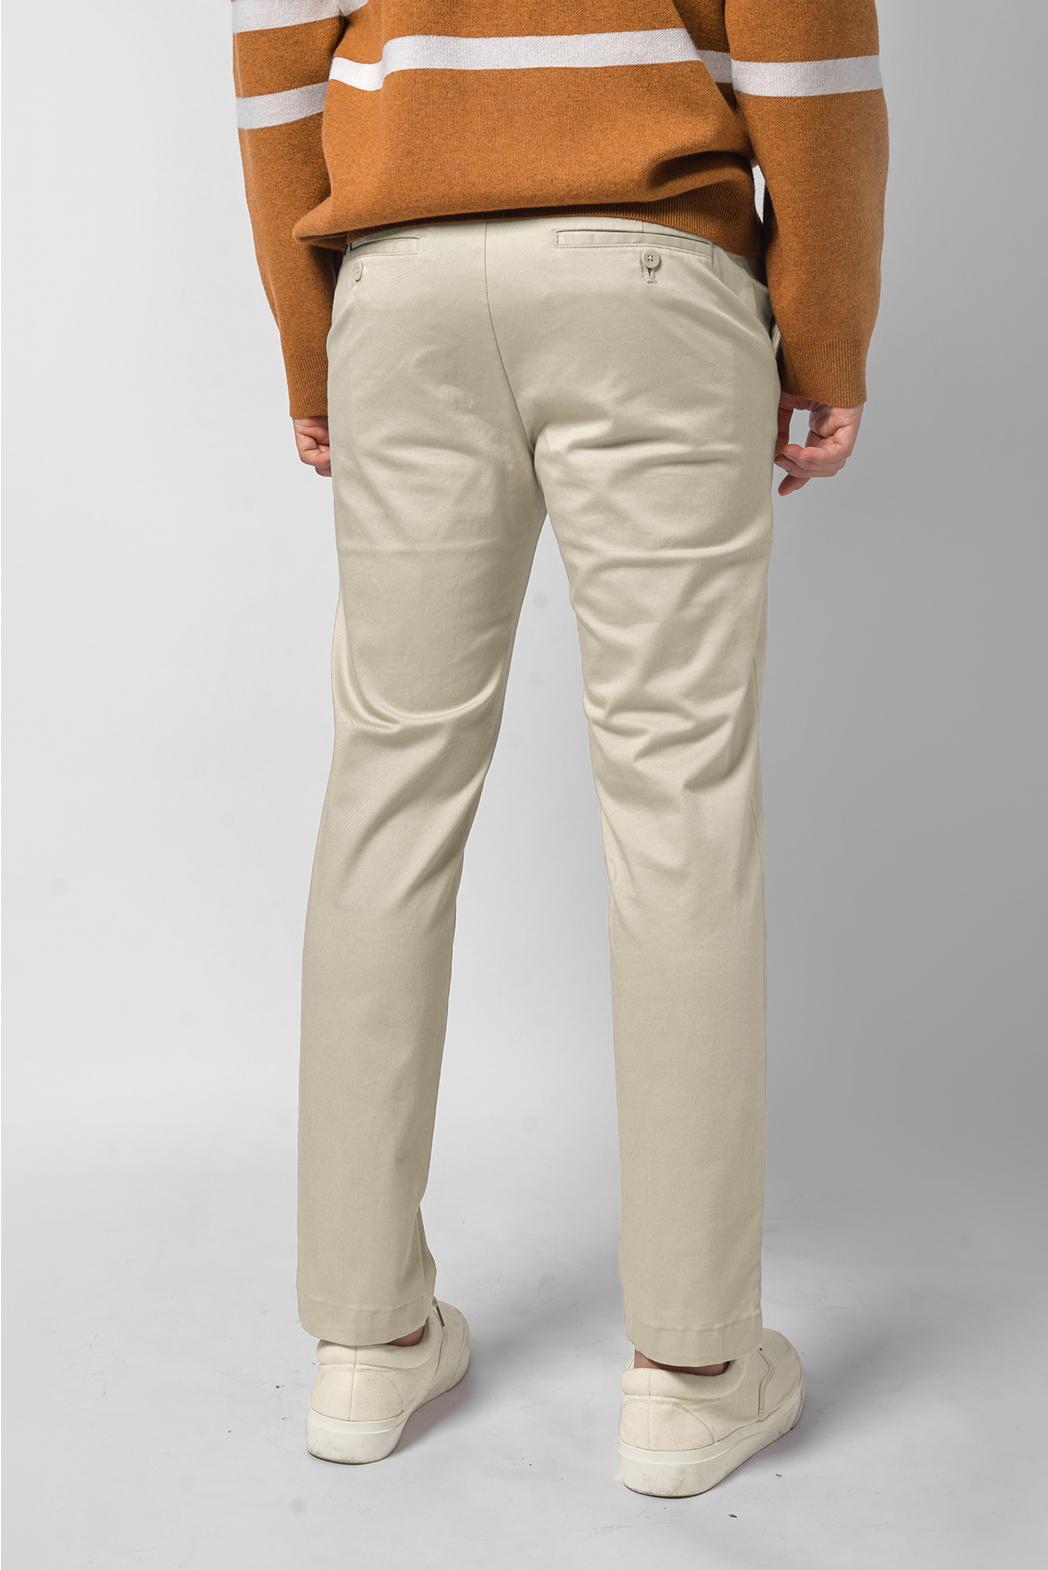 Quần kaki. Cotton. SLIM CROP form - 10F20PCA004